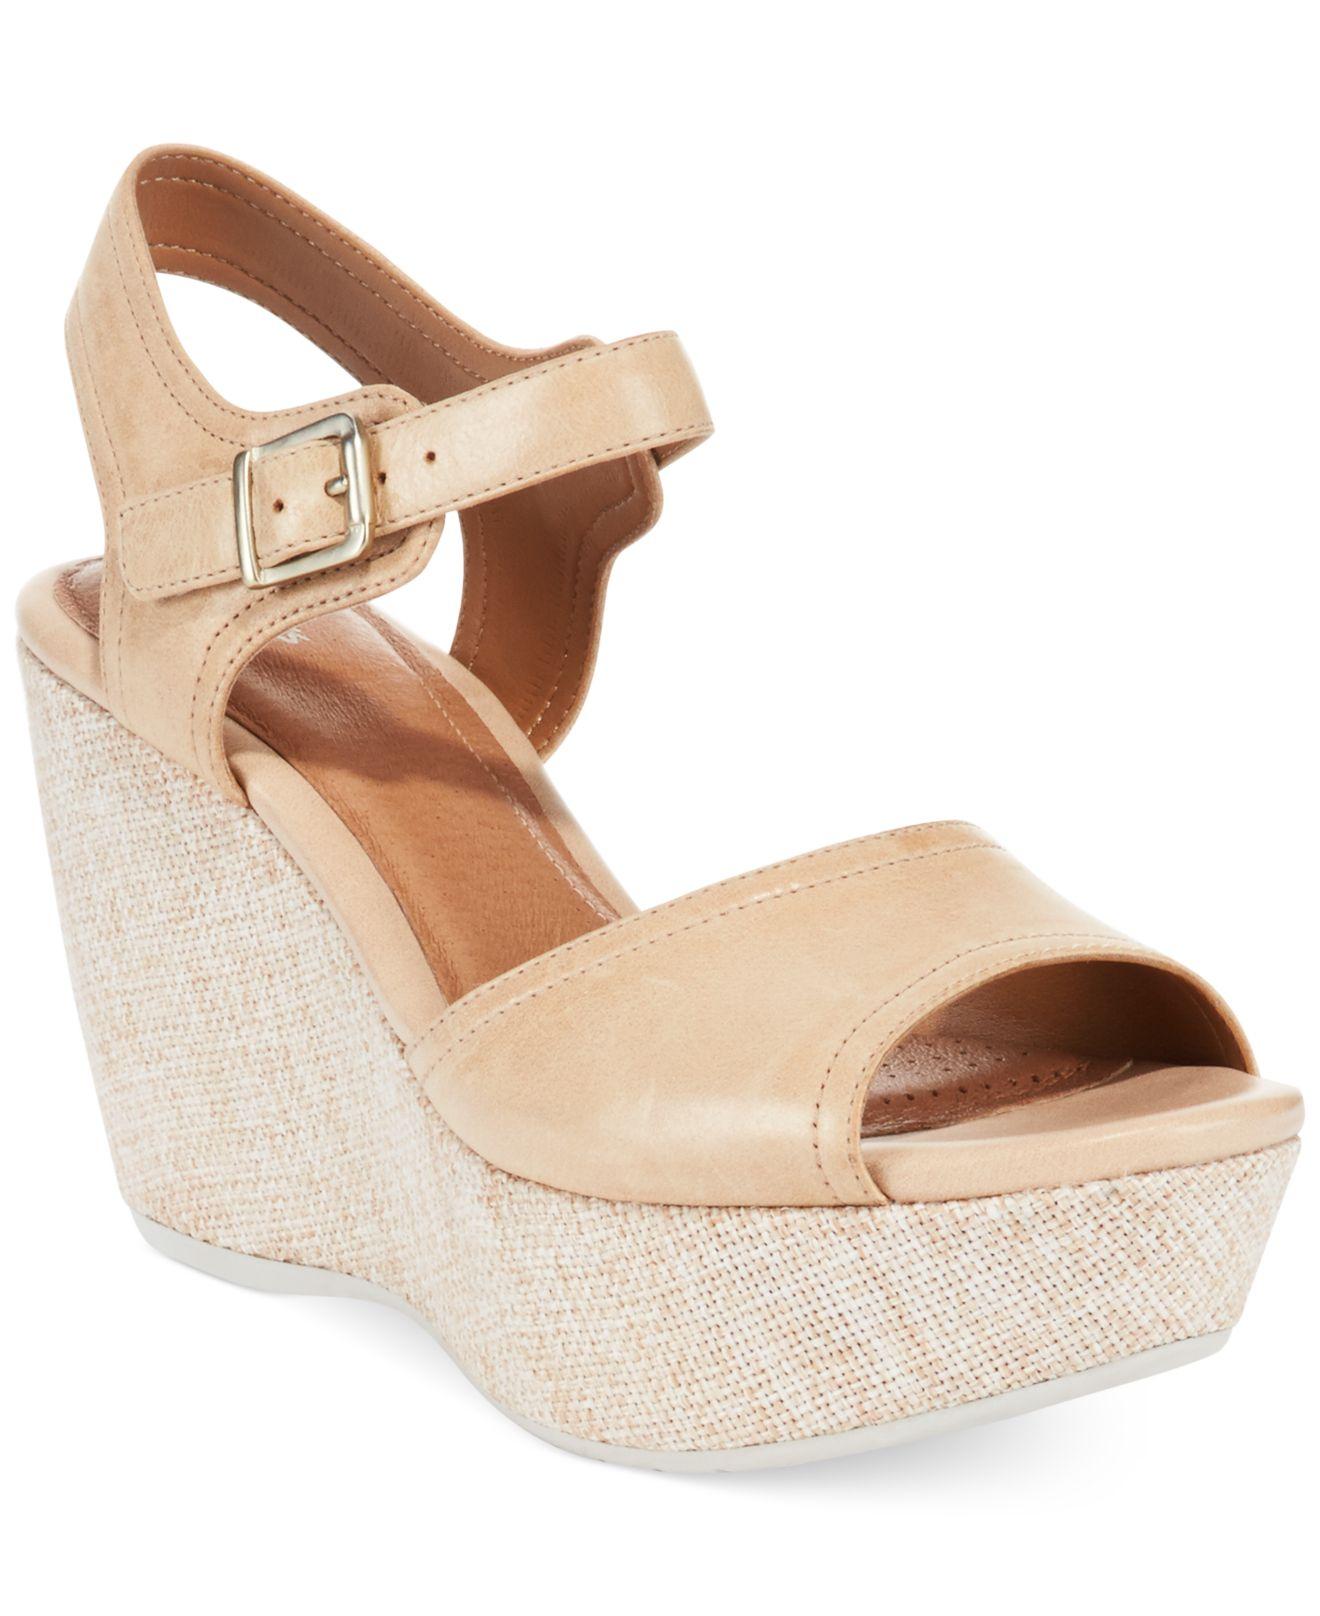 87071183c2c756 Lyst - Clarks Artisan Women s Nadene Lola Platform Wedge Sandals in ...